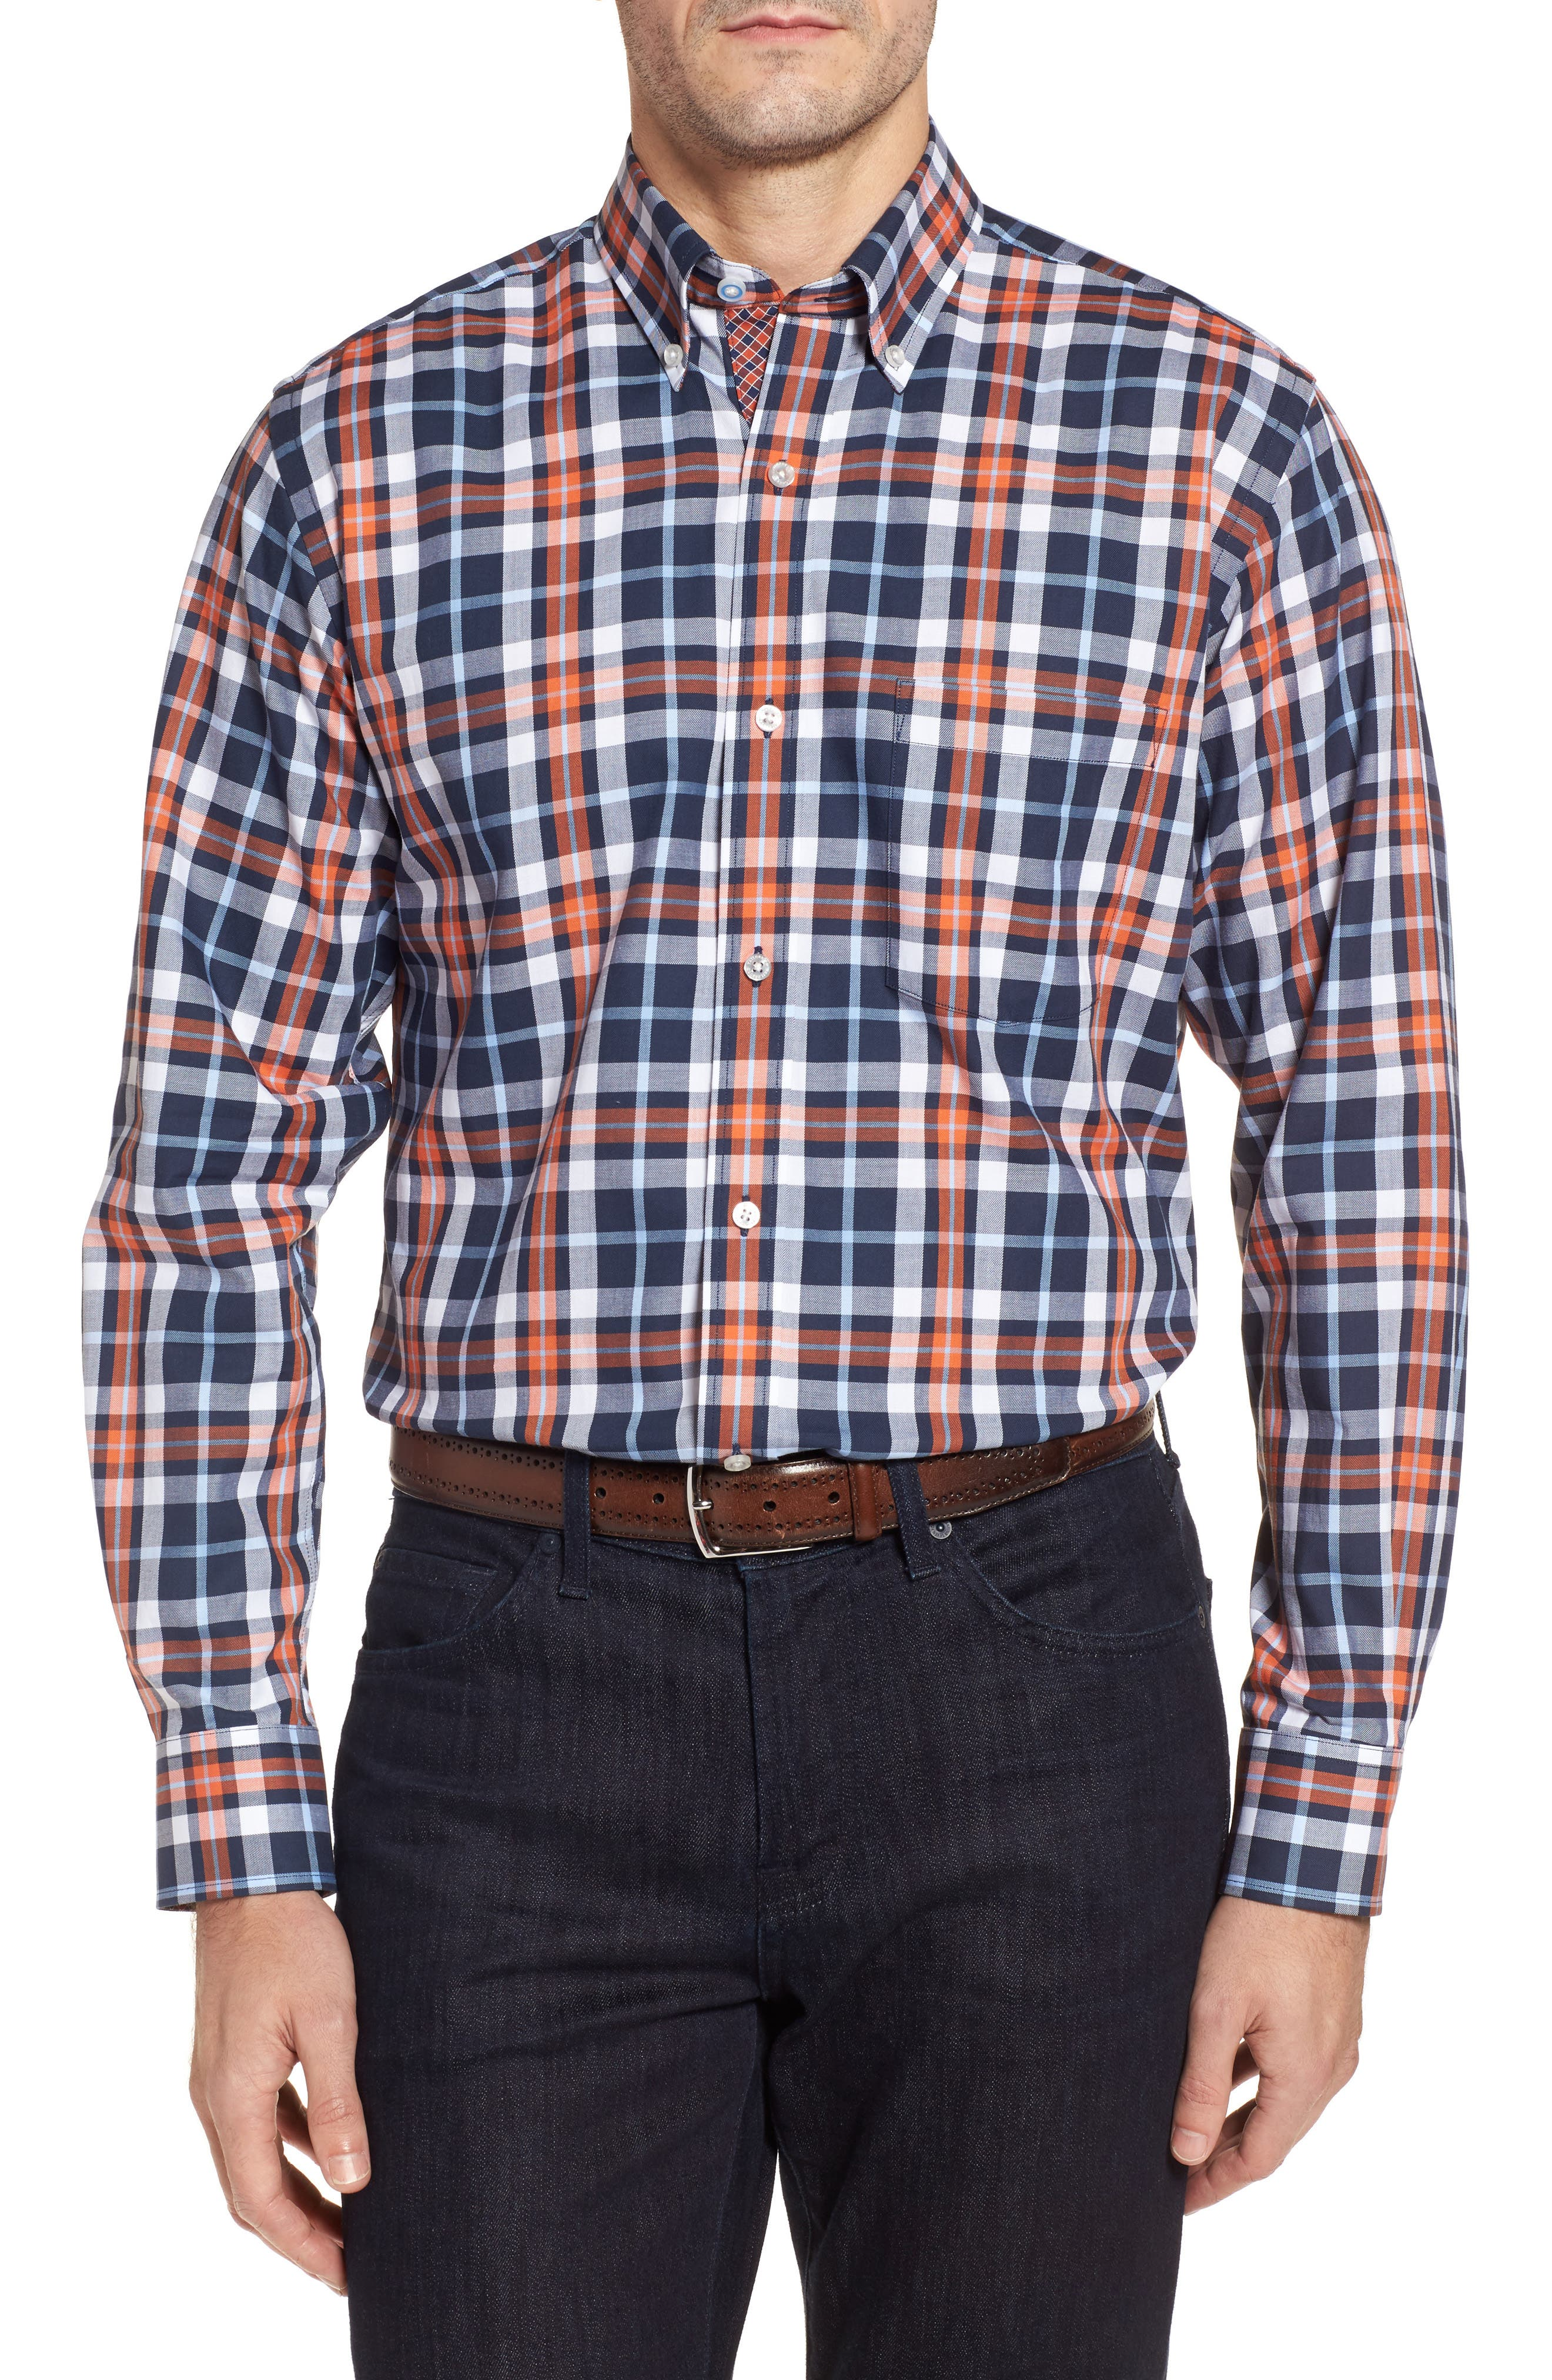 Main Image - TailorByrd Chatham Regular Fit Plaid Sport Shirt